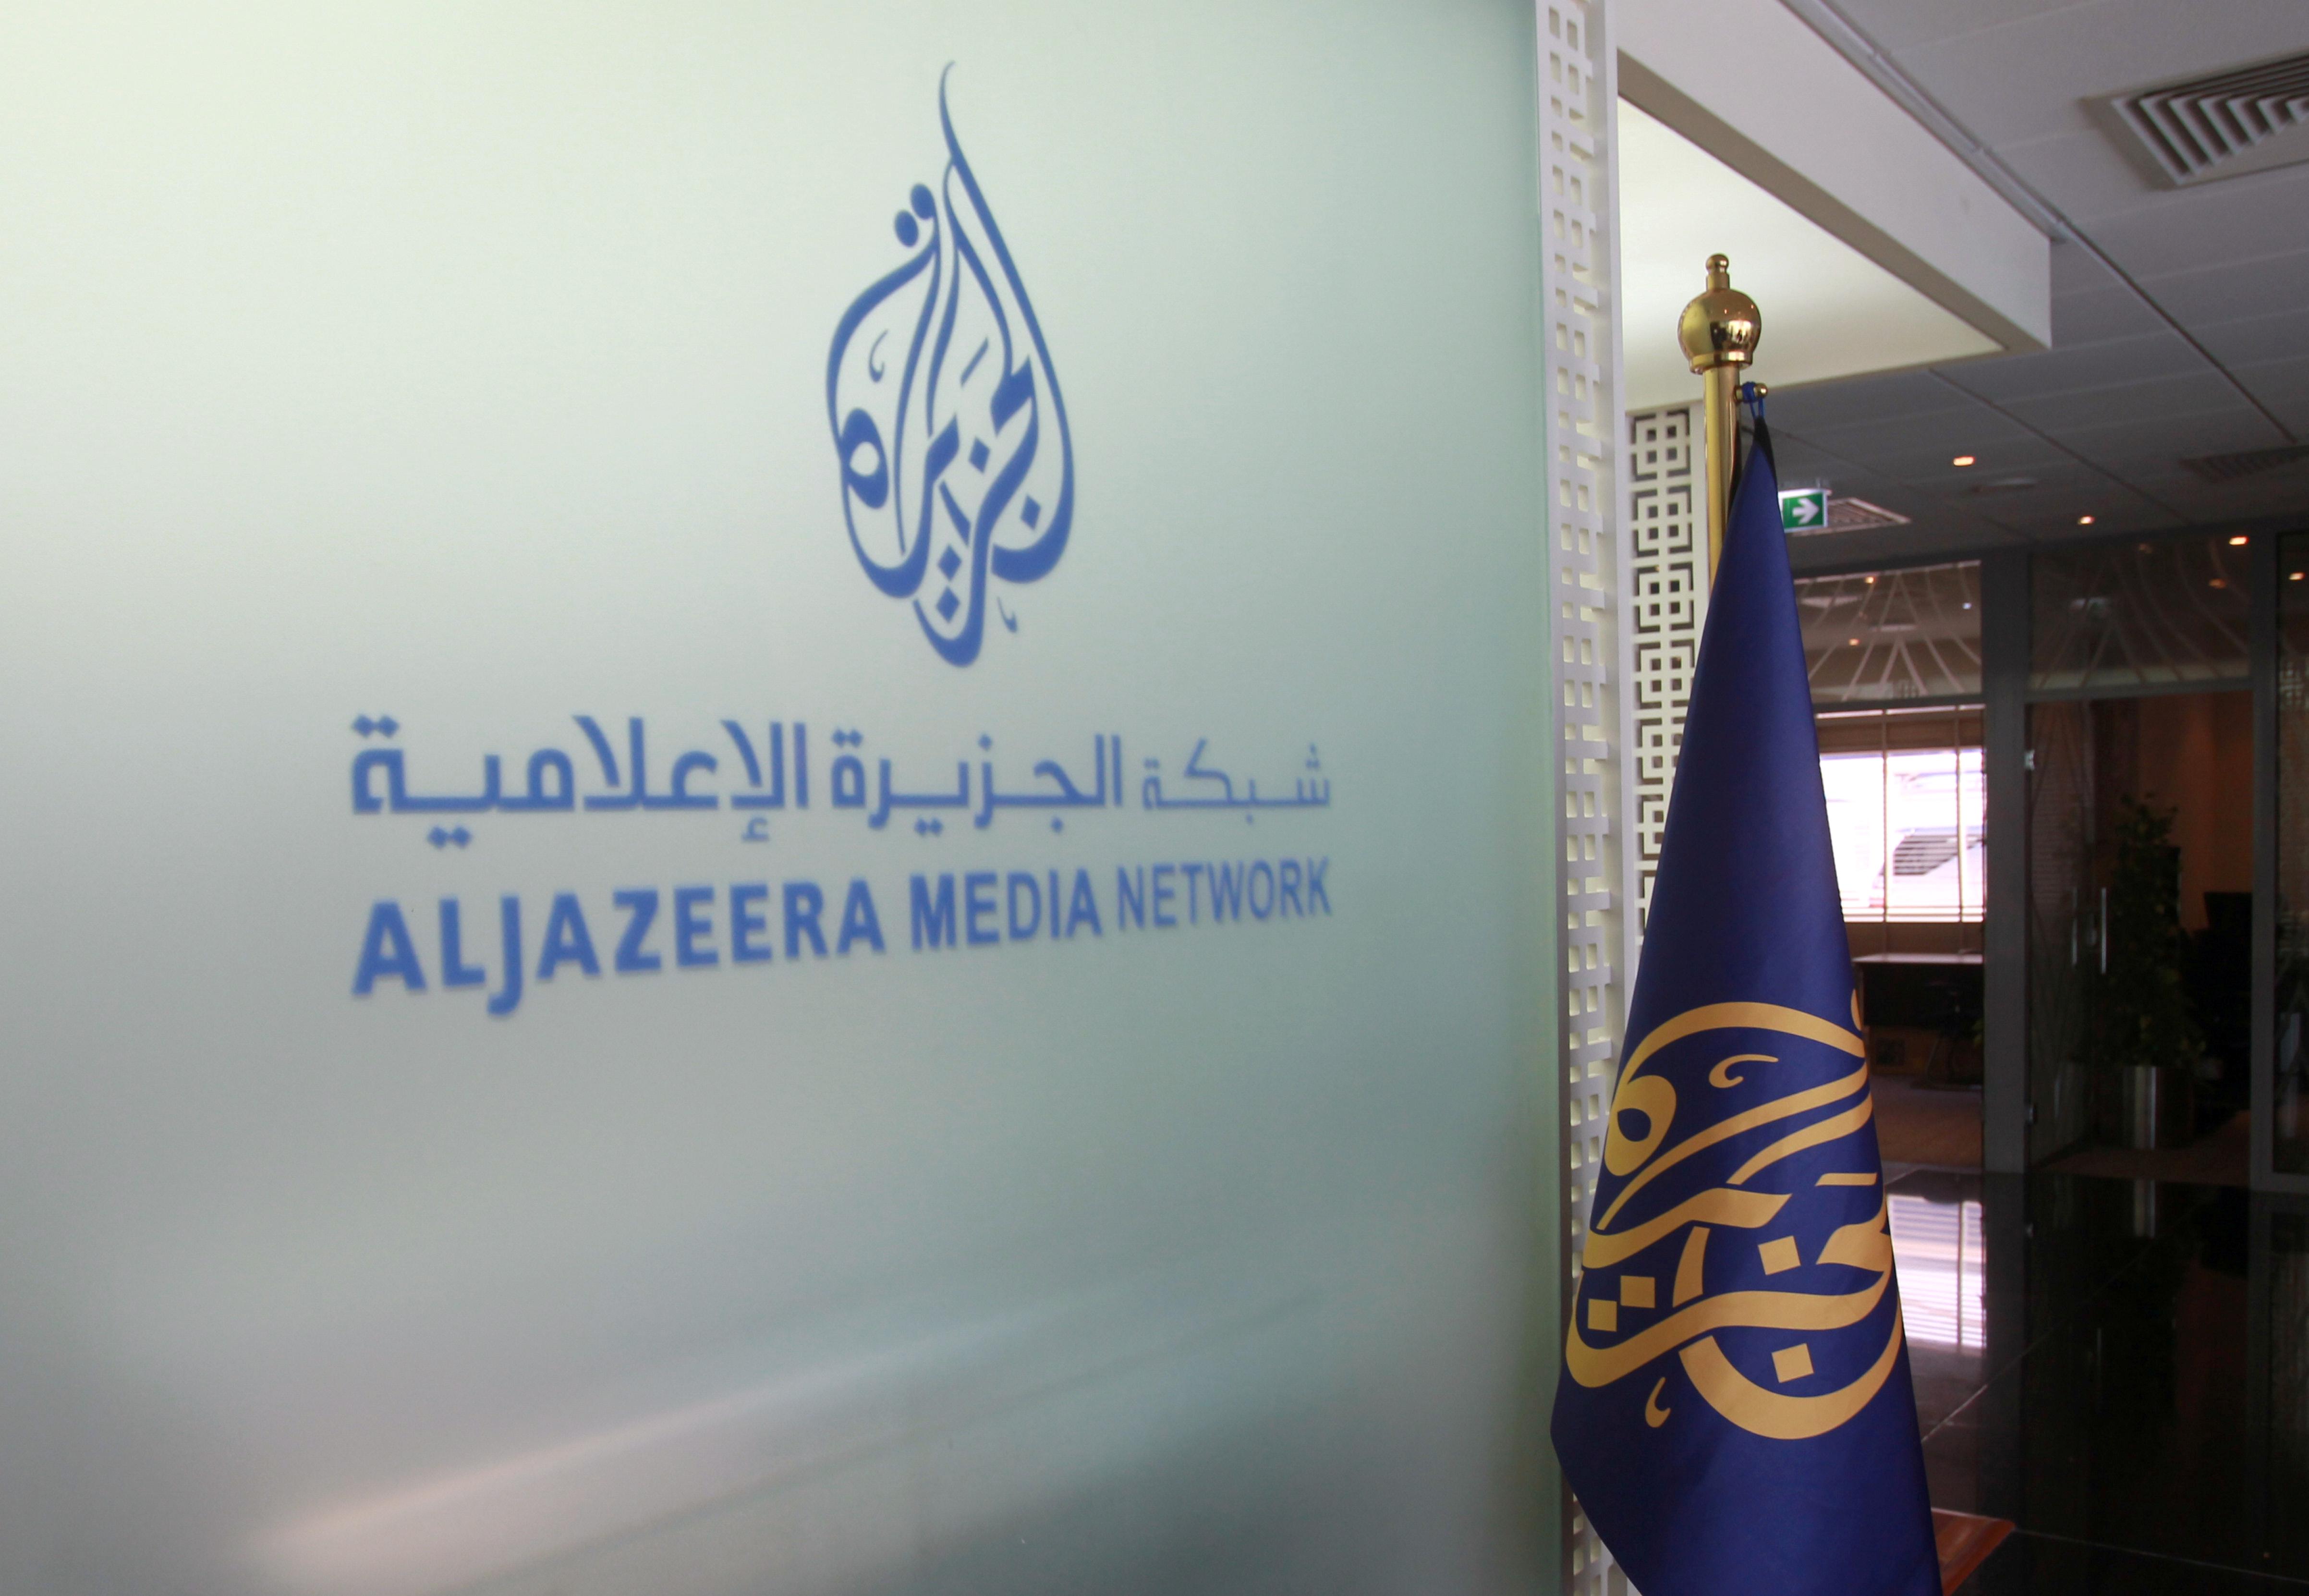 The Al Jazeera Media Network logo is seen inside its headquarters in Doha, Qatar June 8, 2017. REUTERS/Naseem Zeitoon